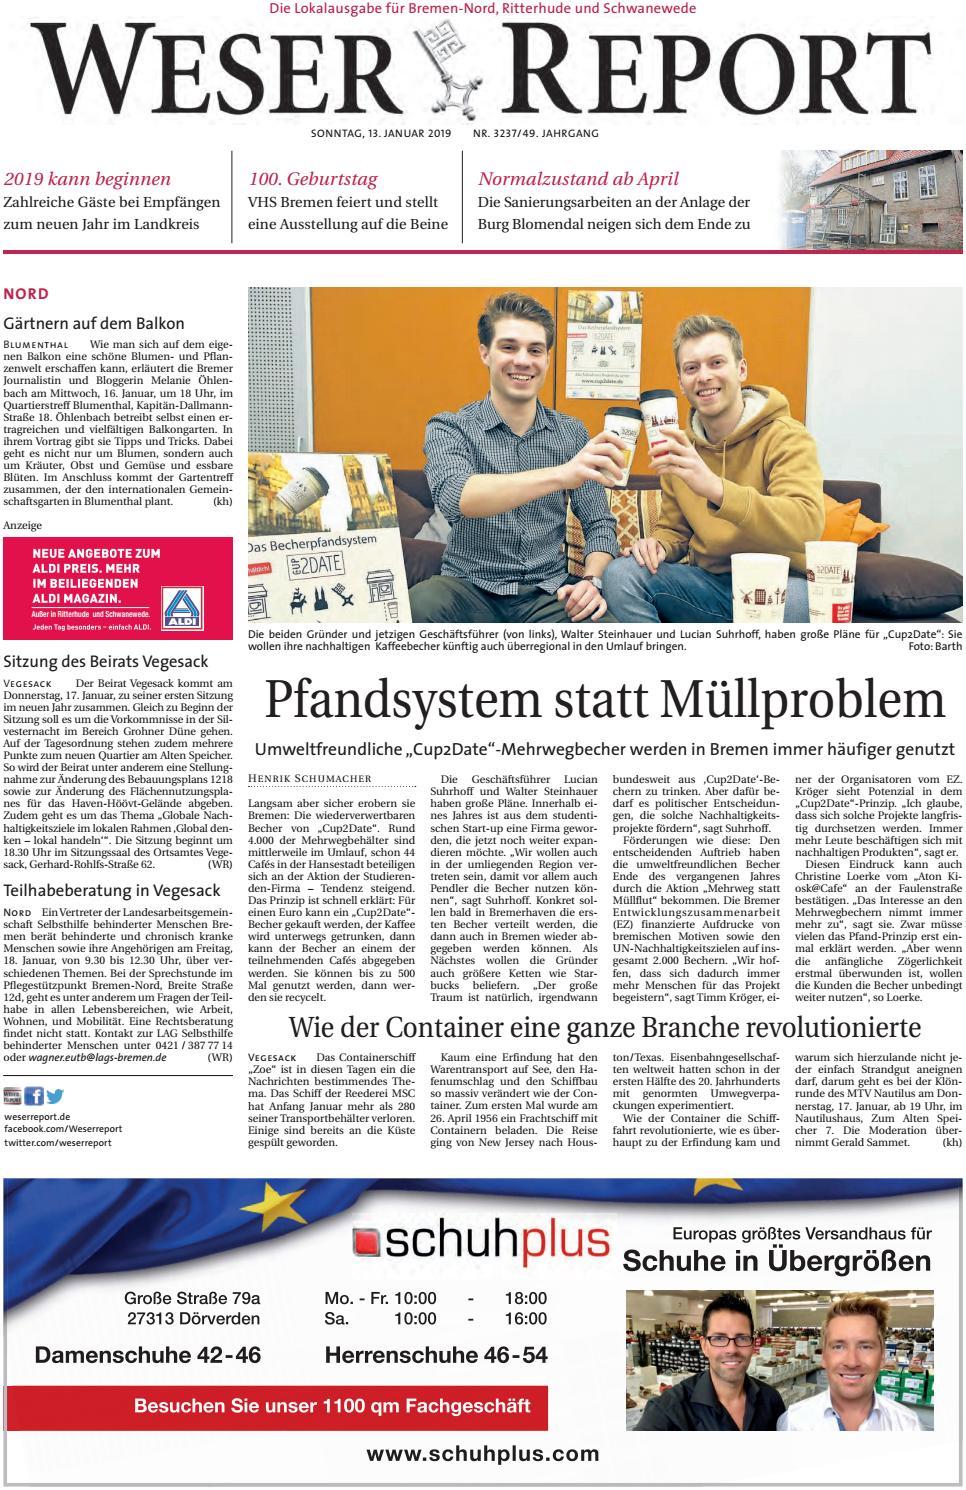 Weser Report - Nord vom 13.01.2019 by KPS Verlagsgesellschaft mbH ...